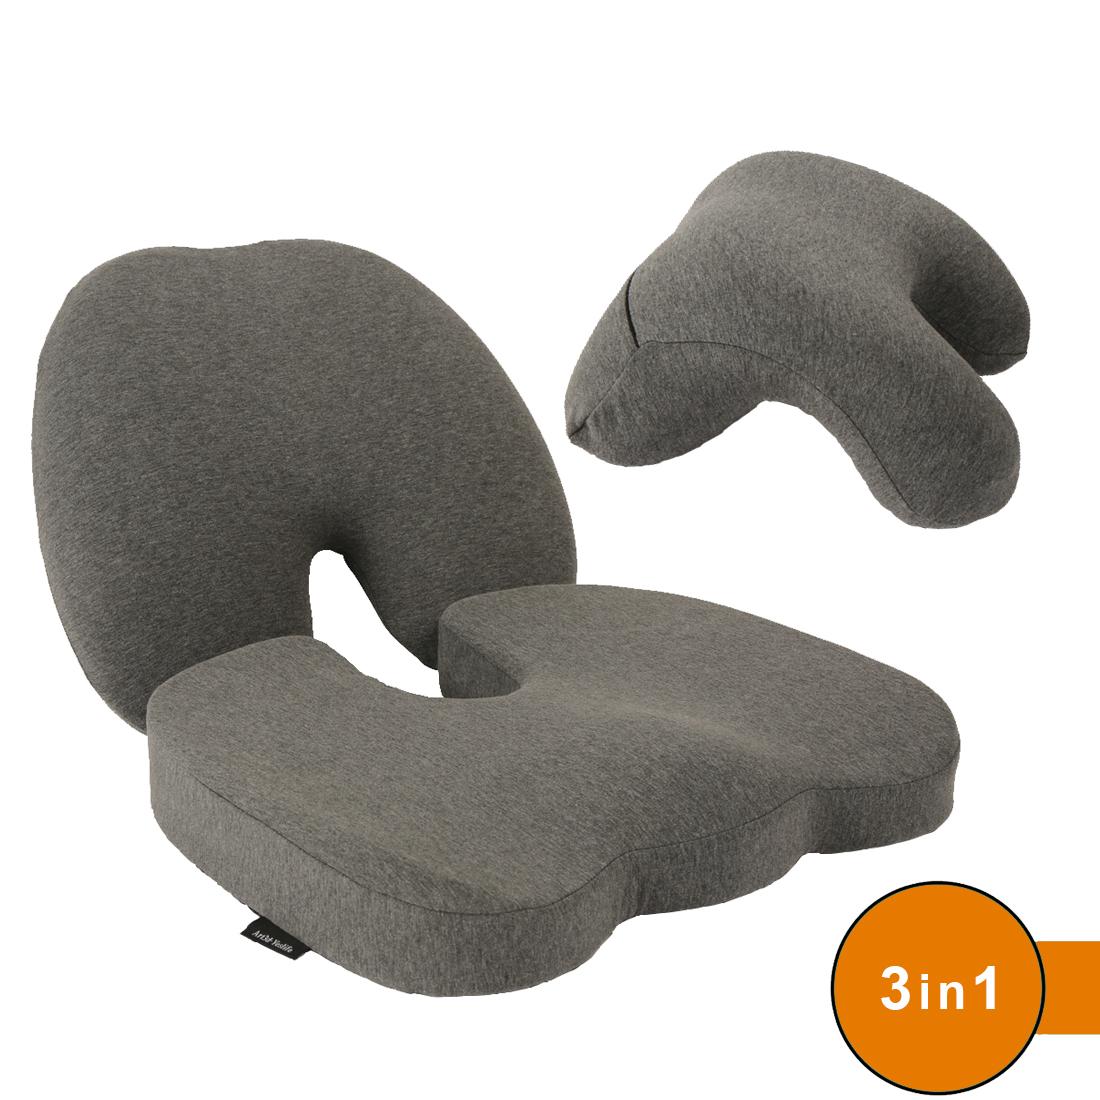 Premium Lumbar Support Pillow, Fuctional Neck & Nap Pillow and Seat Cushion Coccyx Orthopedic Memory Foam, Set of 3, Dark Gray